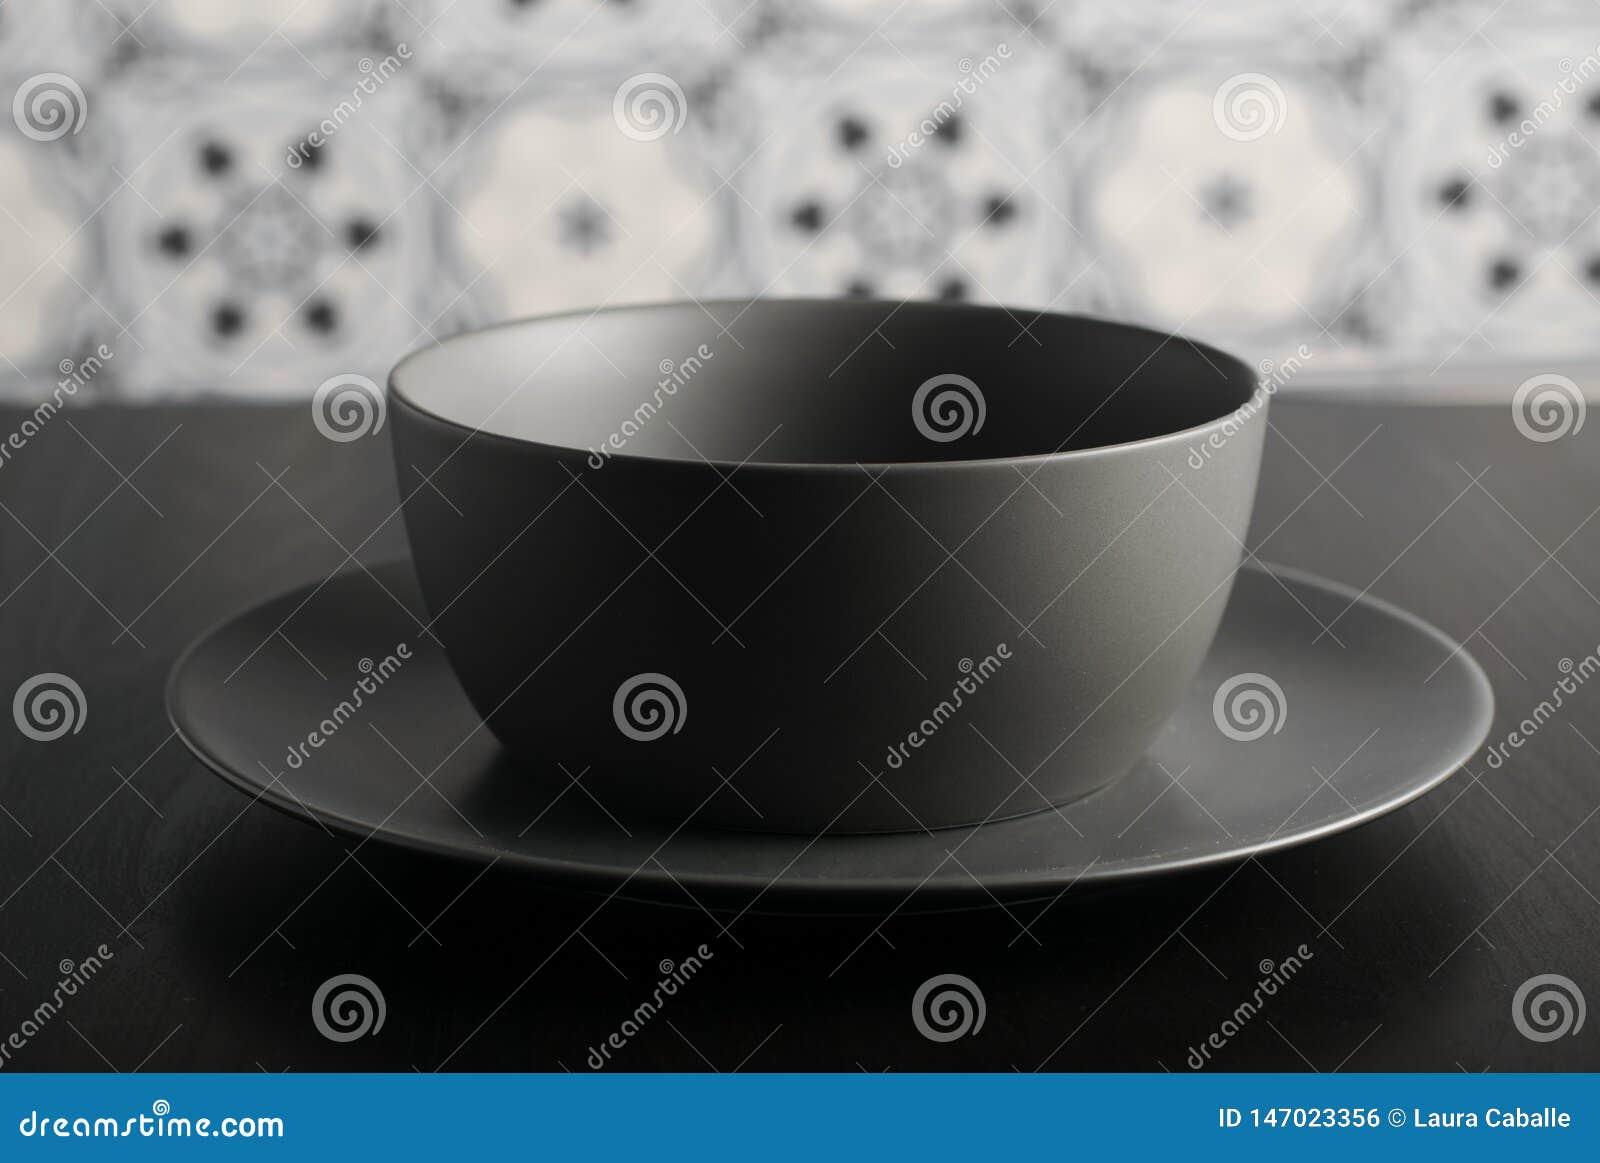 Пустые шар и плита